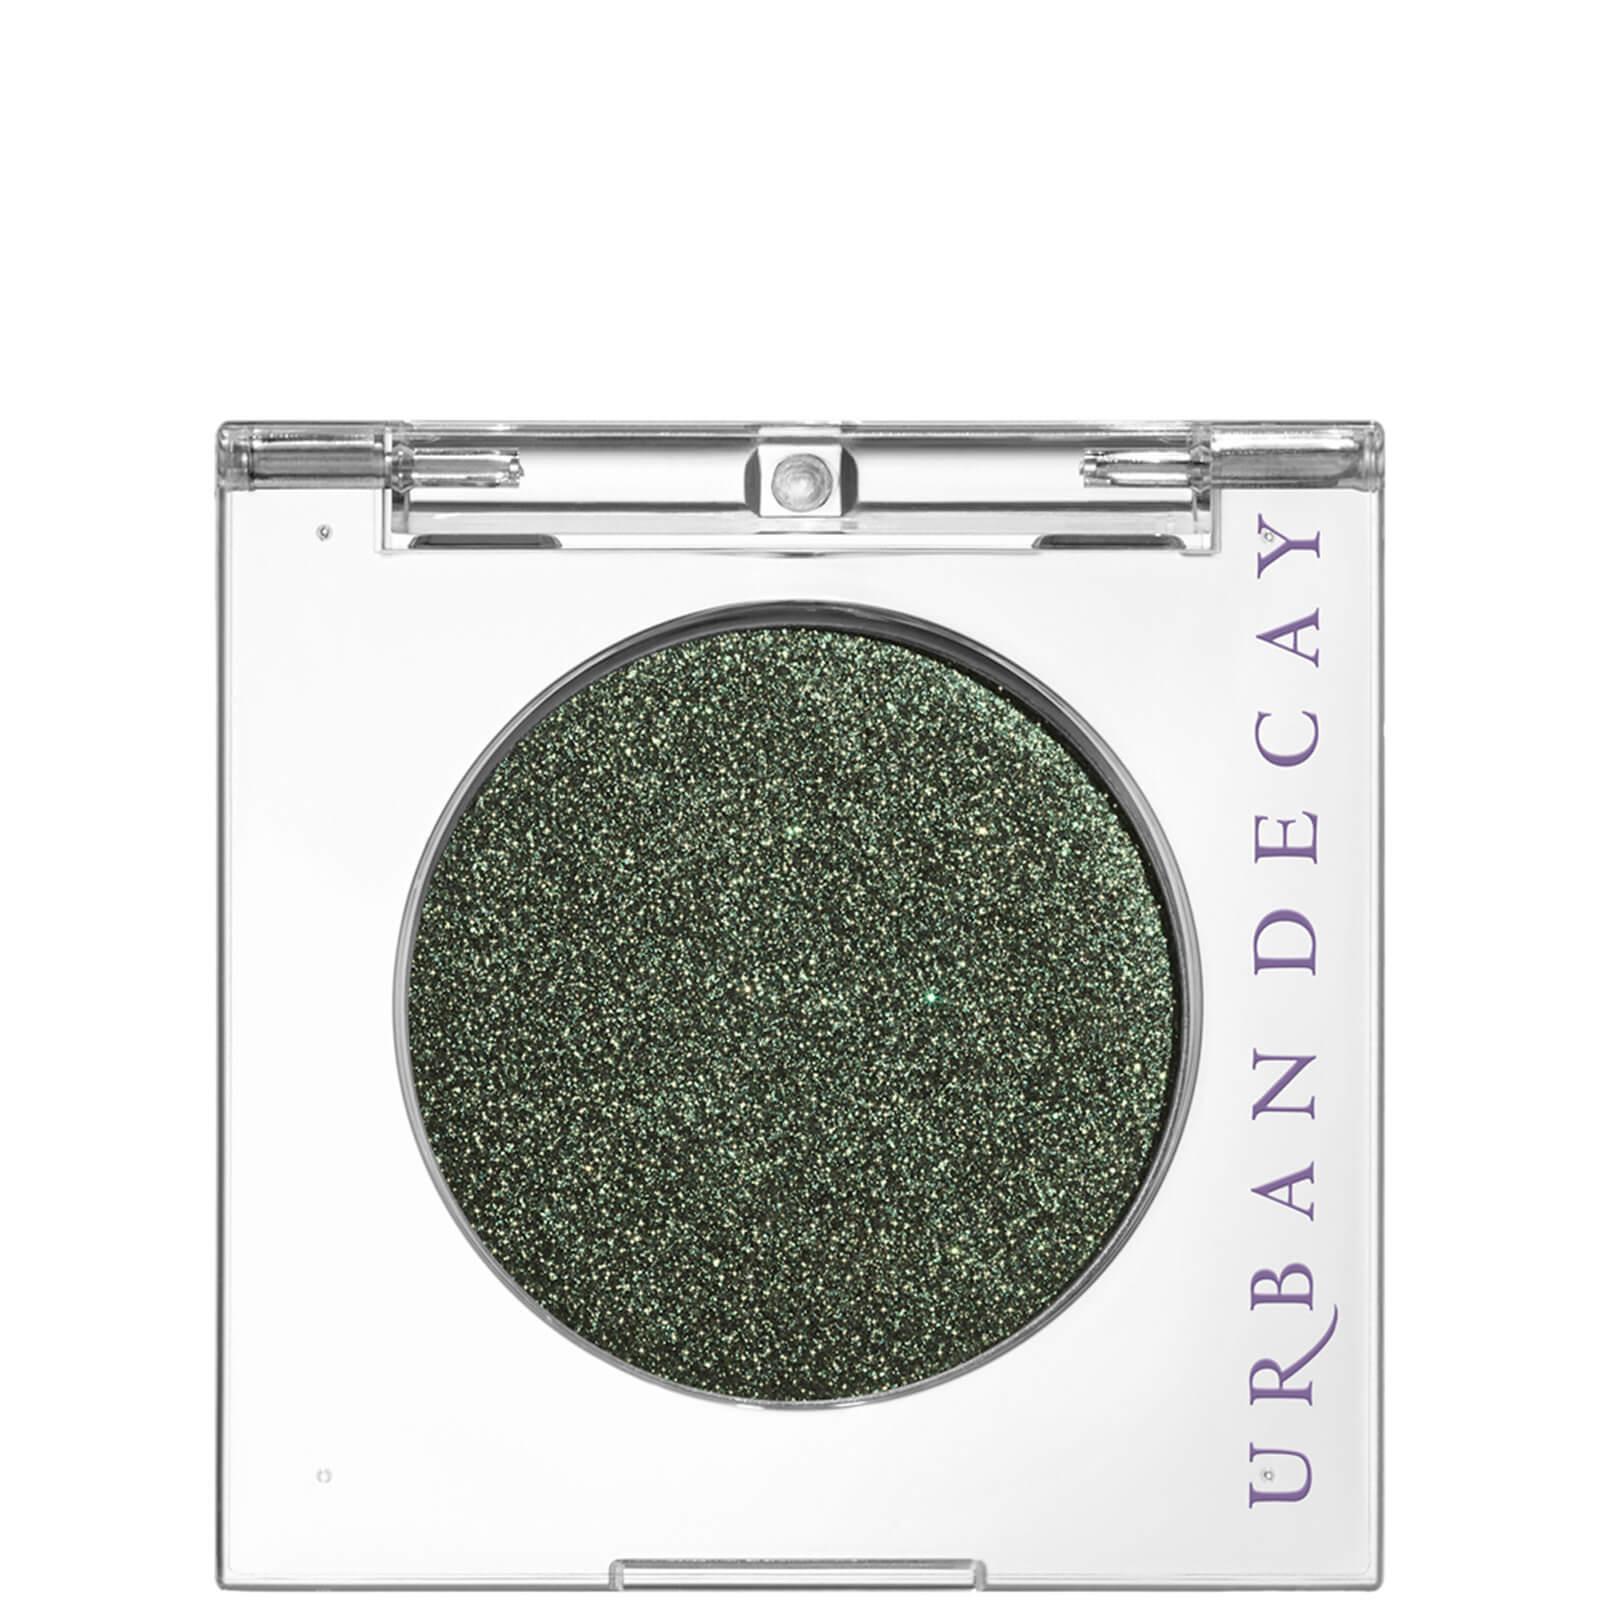 Купить Urban Decay 24/7 Eyeshadow Mono Moondust (Various Shades) - Psych